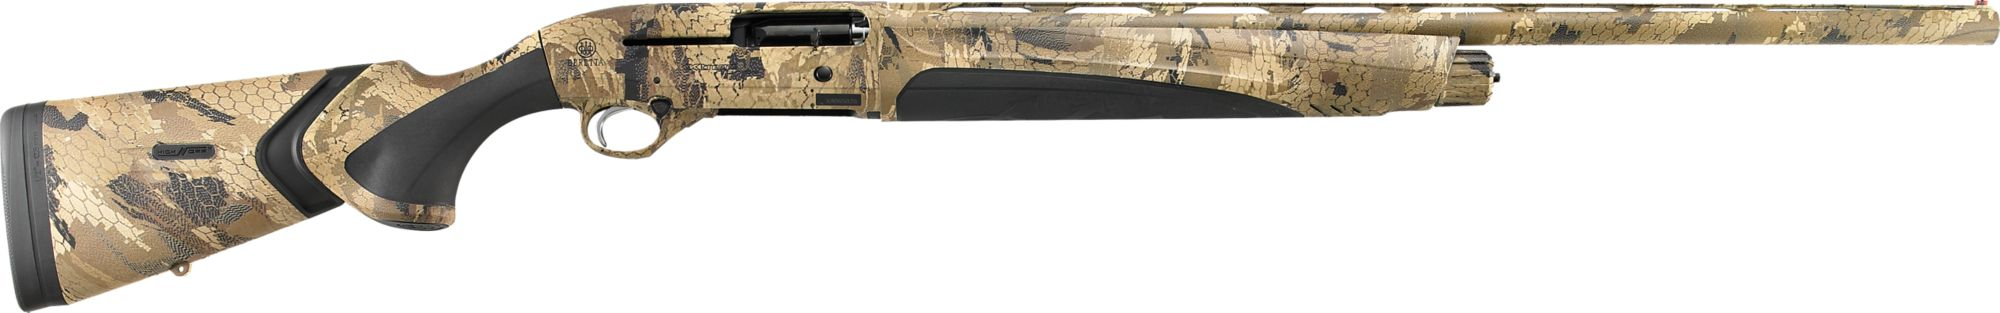 Beretta A400 Xtreme Unico Shotgun - Optifade | Field & Stream on Beretta Outdoor Living id=21229